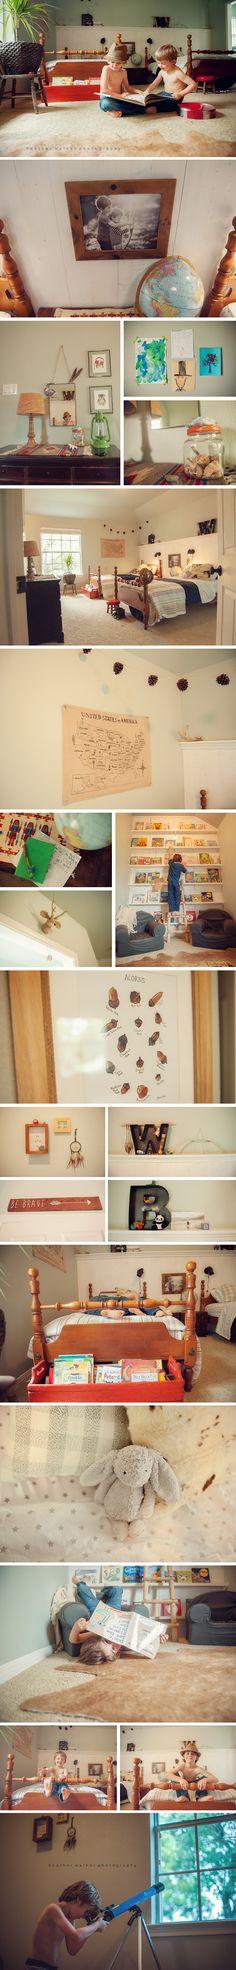 Boys Adventure Room Decoration - Capturing Joy with Kristen Duke Boys Room Makeover Ideas! Boy Decor, Boys Room Decor, Boy Room, Bedroom Themes, Kids Bedroom, Books For Boys, Trendy Kids, Kid Spaces, Room Inspiration